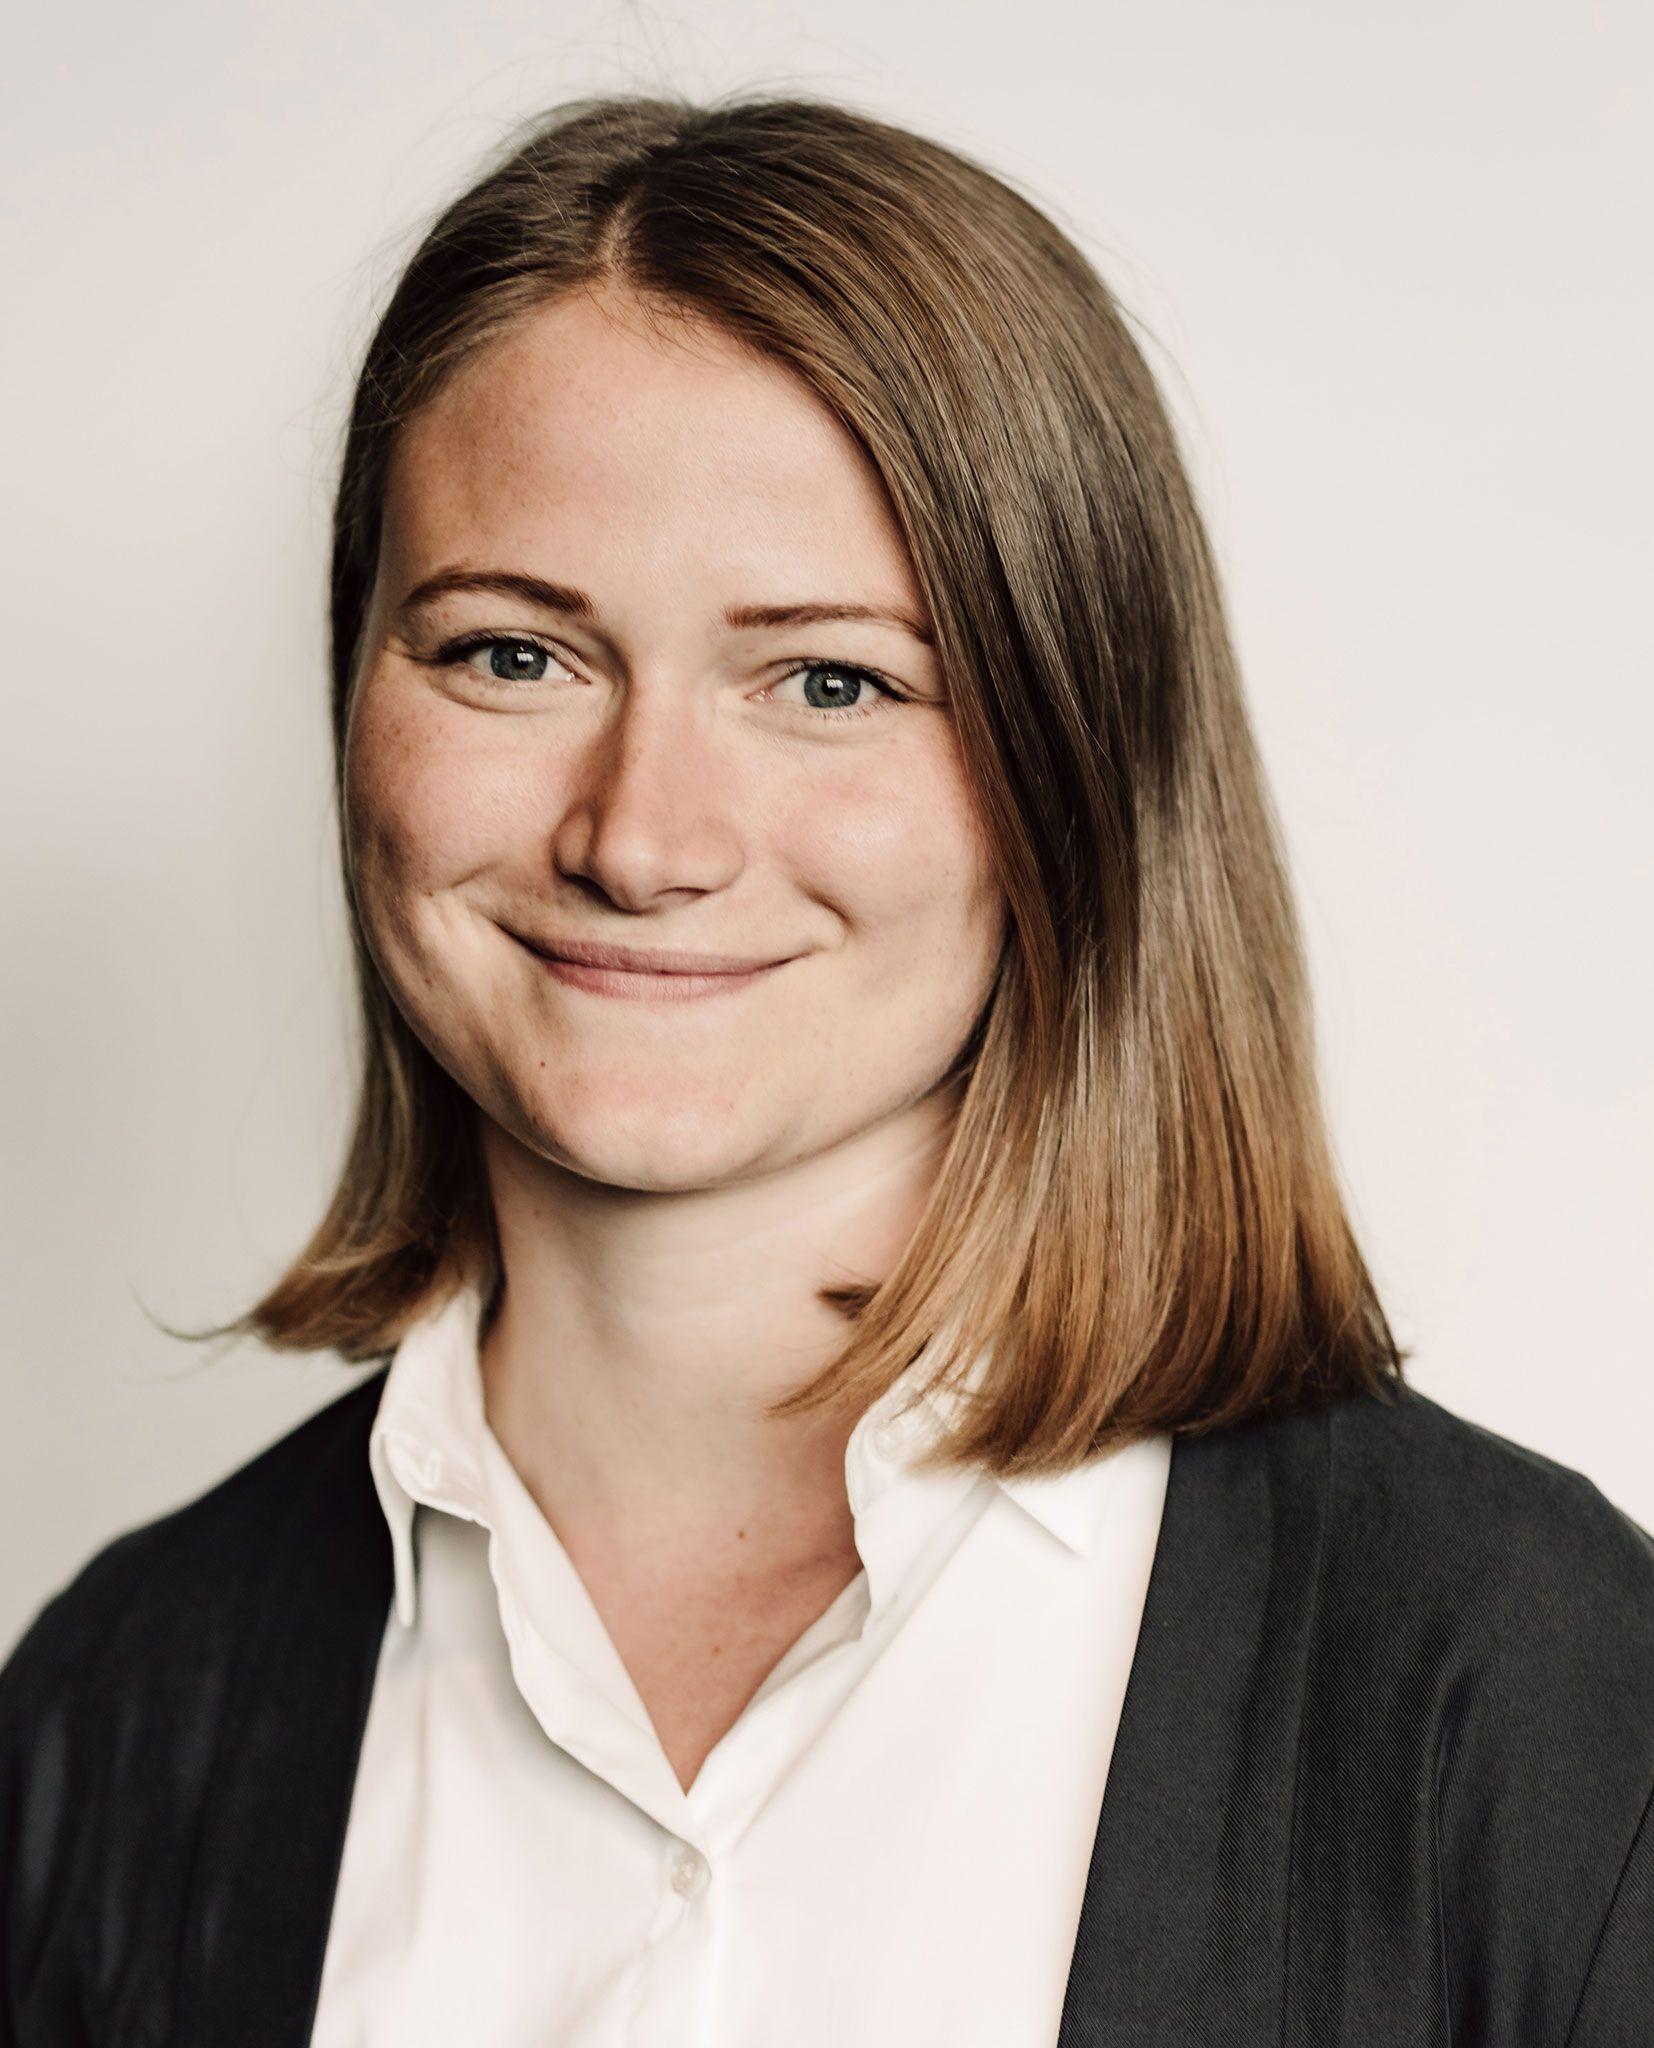 Mina Bergerøy Ryssdal